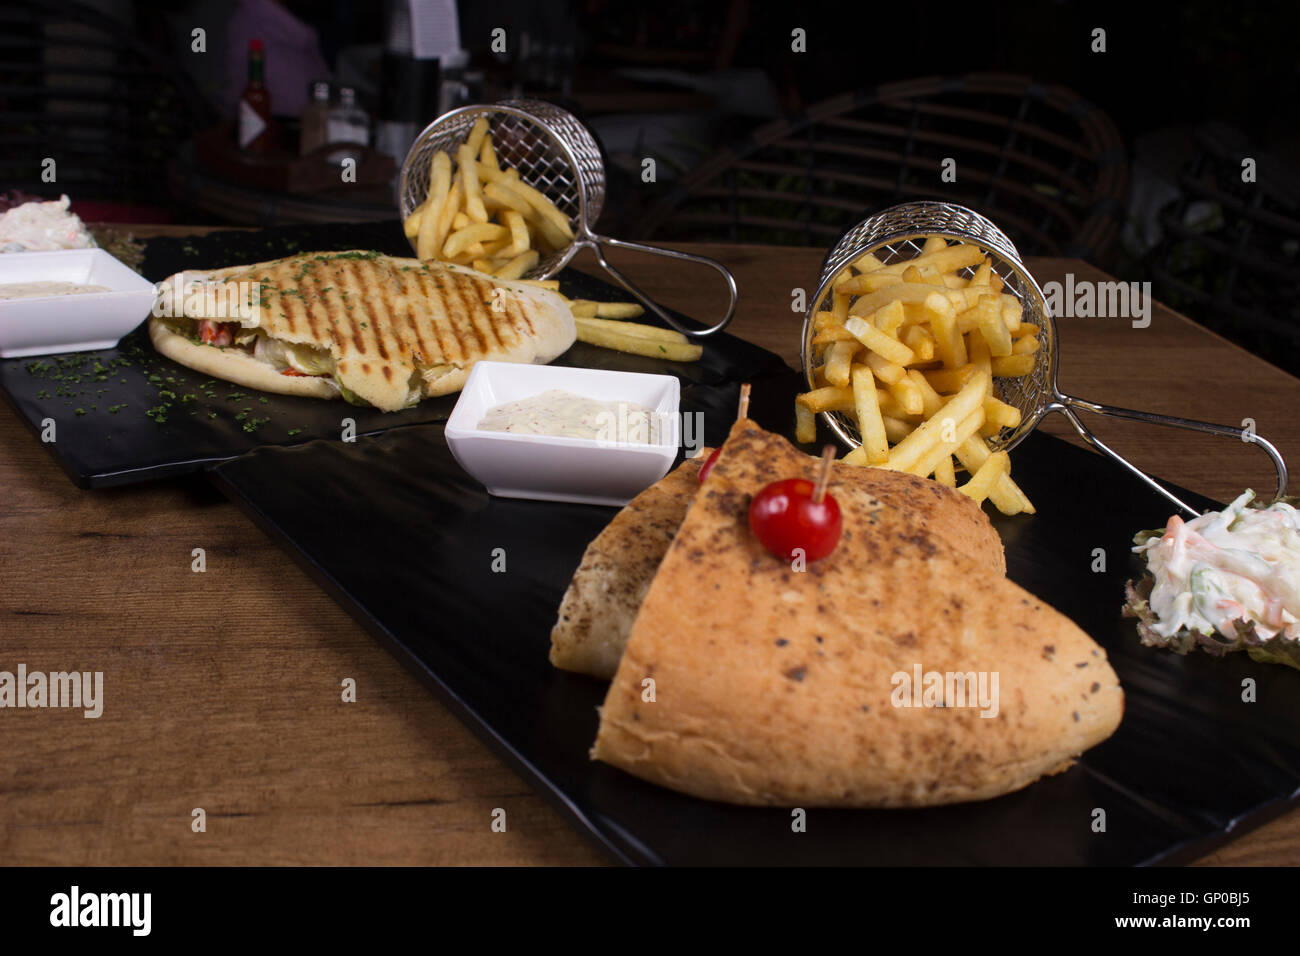 Cajun spiced cottage cheese sandwich and Greek pita gyro - Stock Image